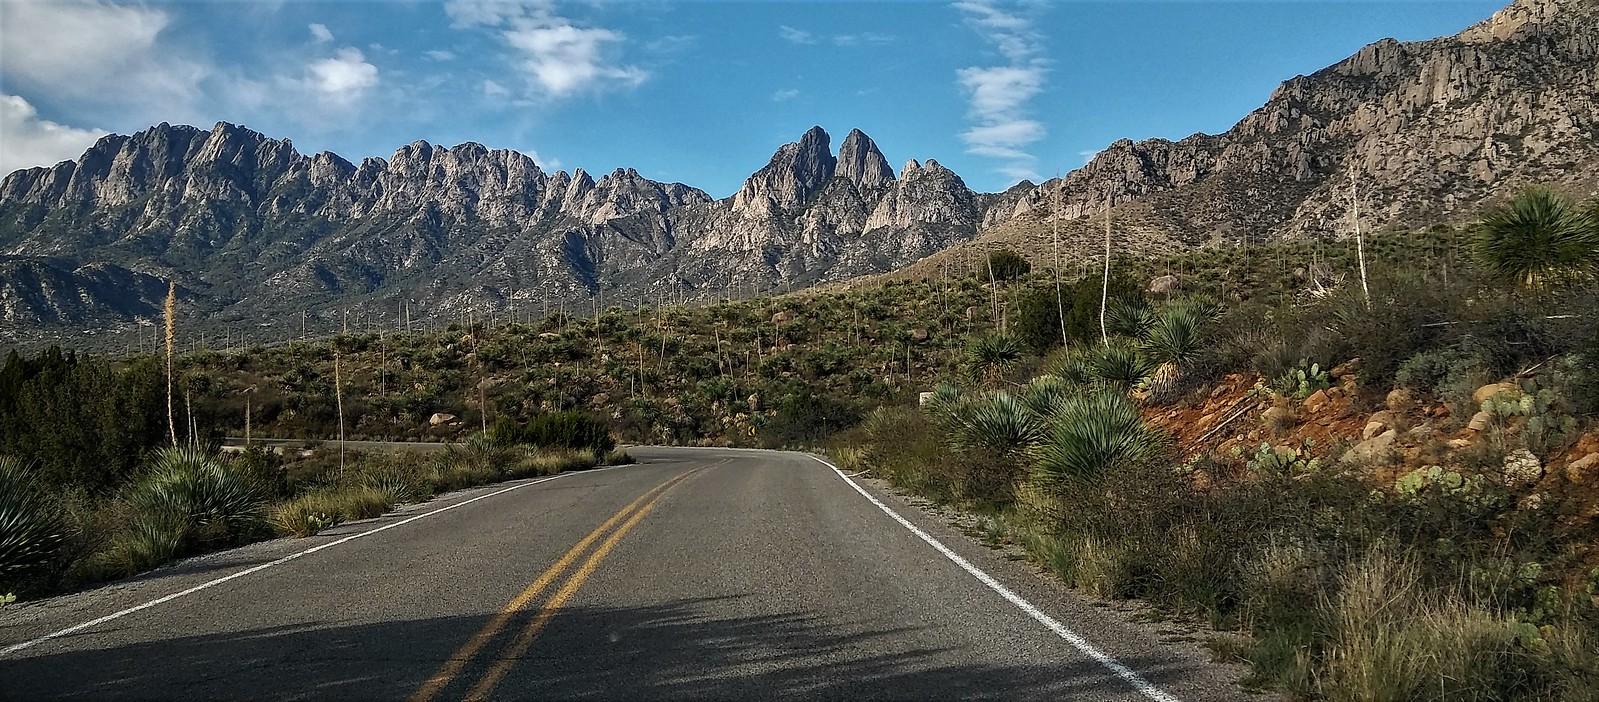 Aguirre Spring, Organ Mountains, NM